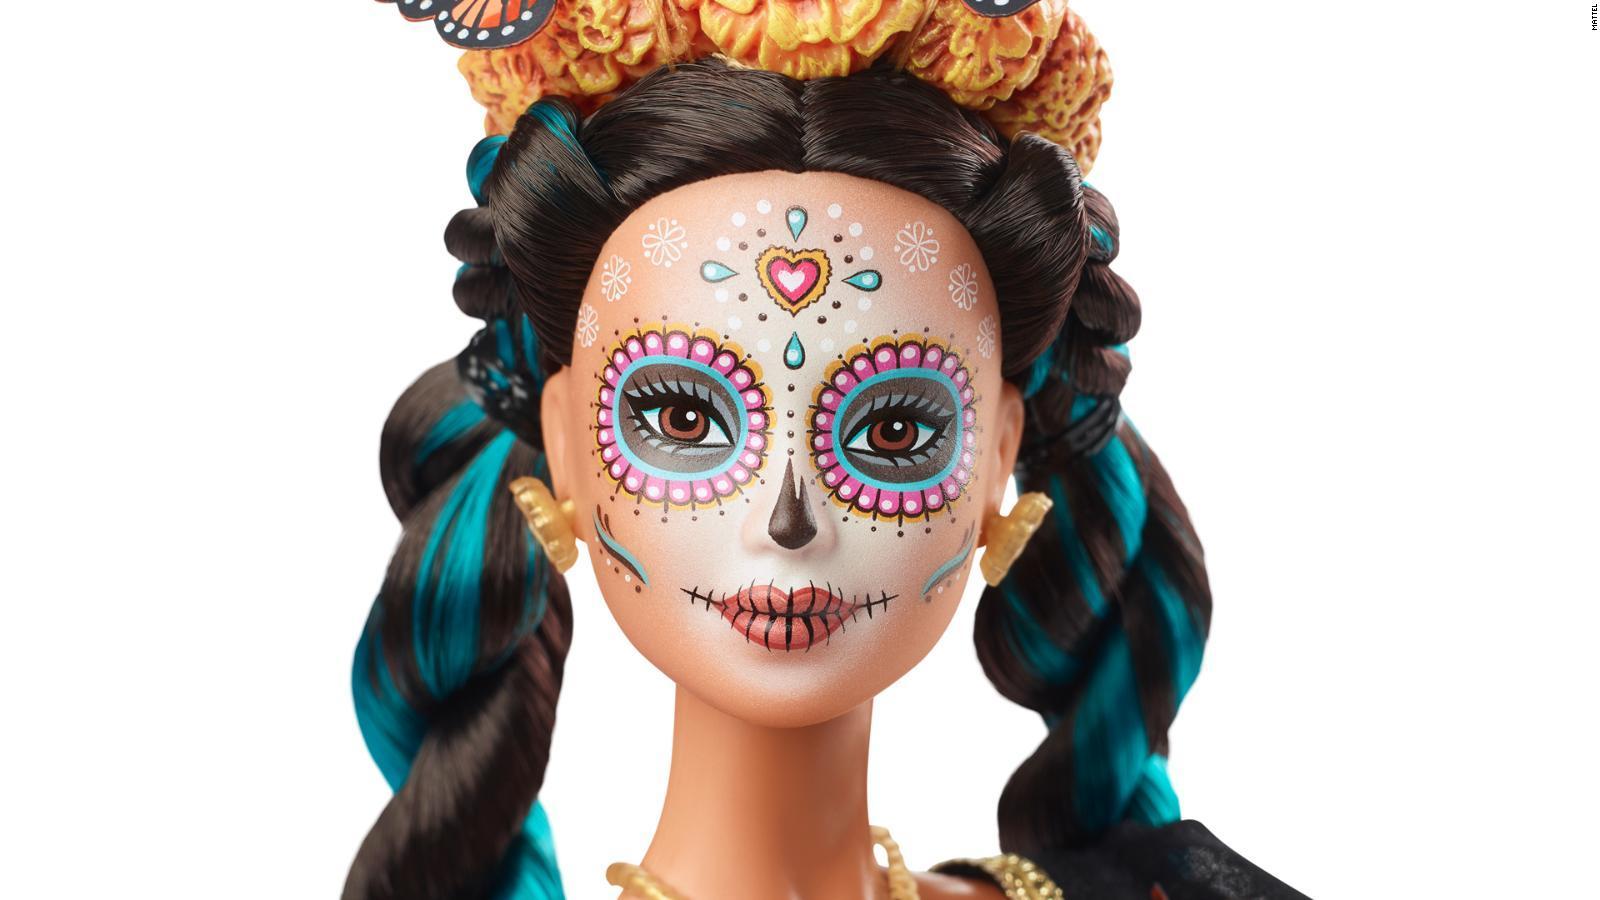 Barbie celebra la vida